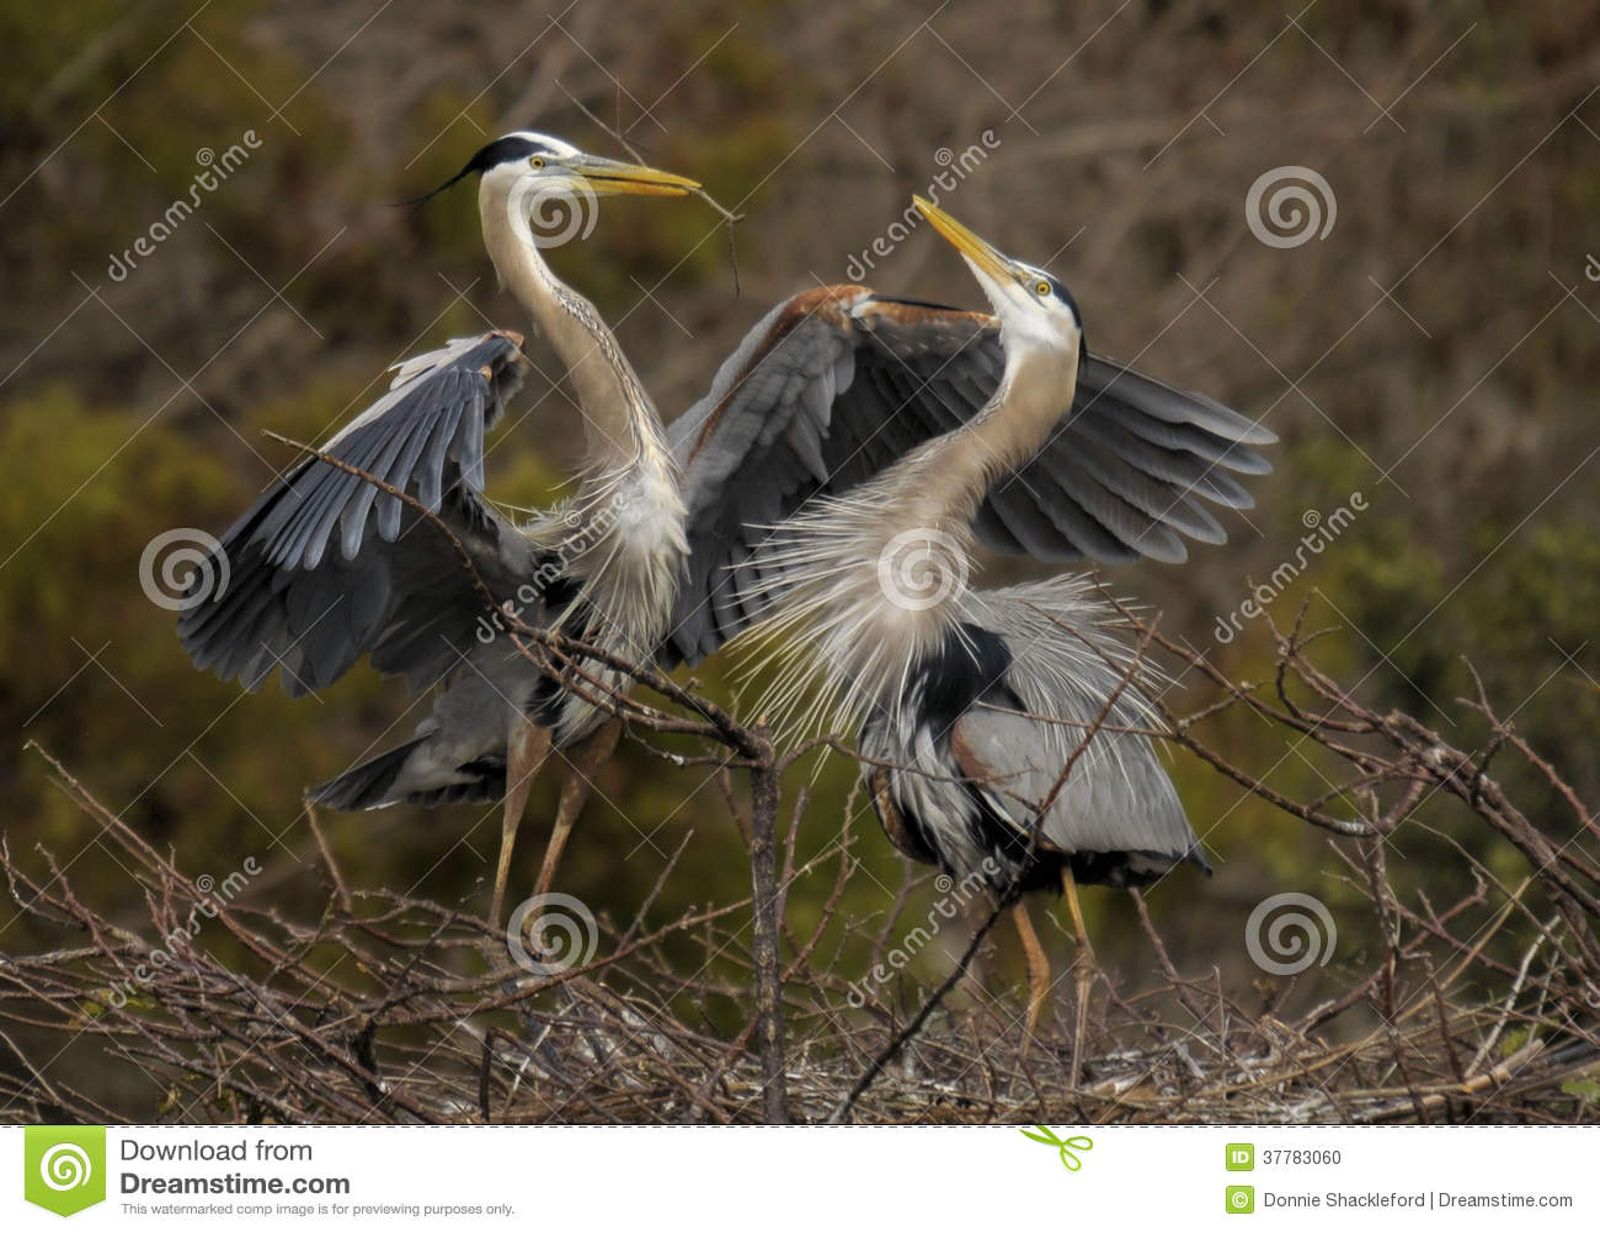 Heron Hug